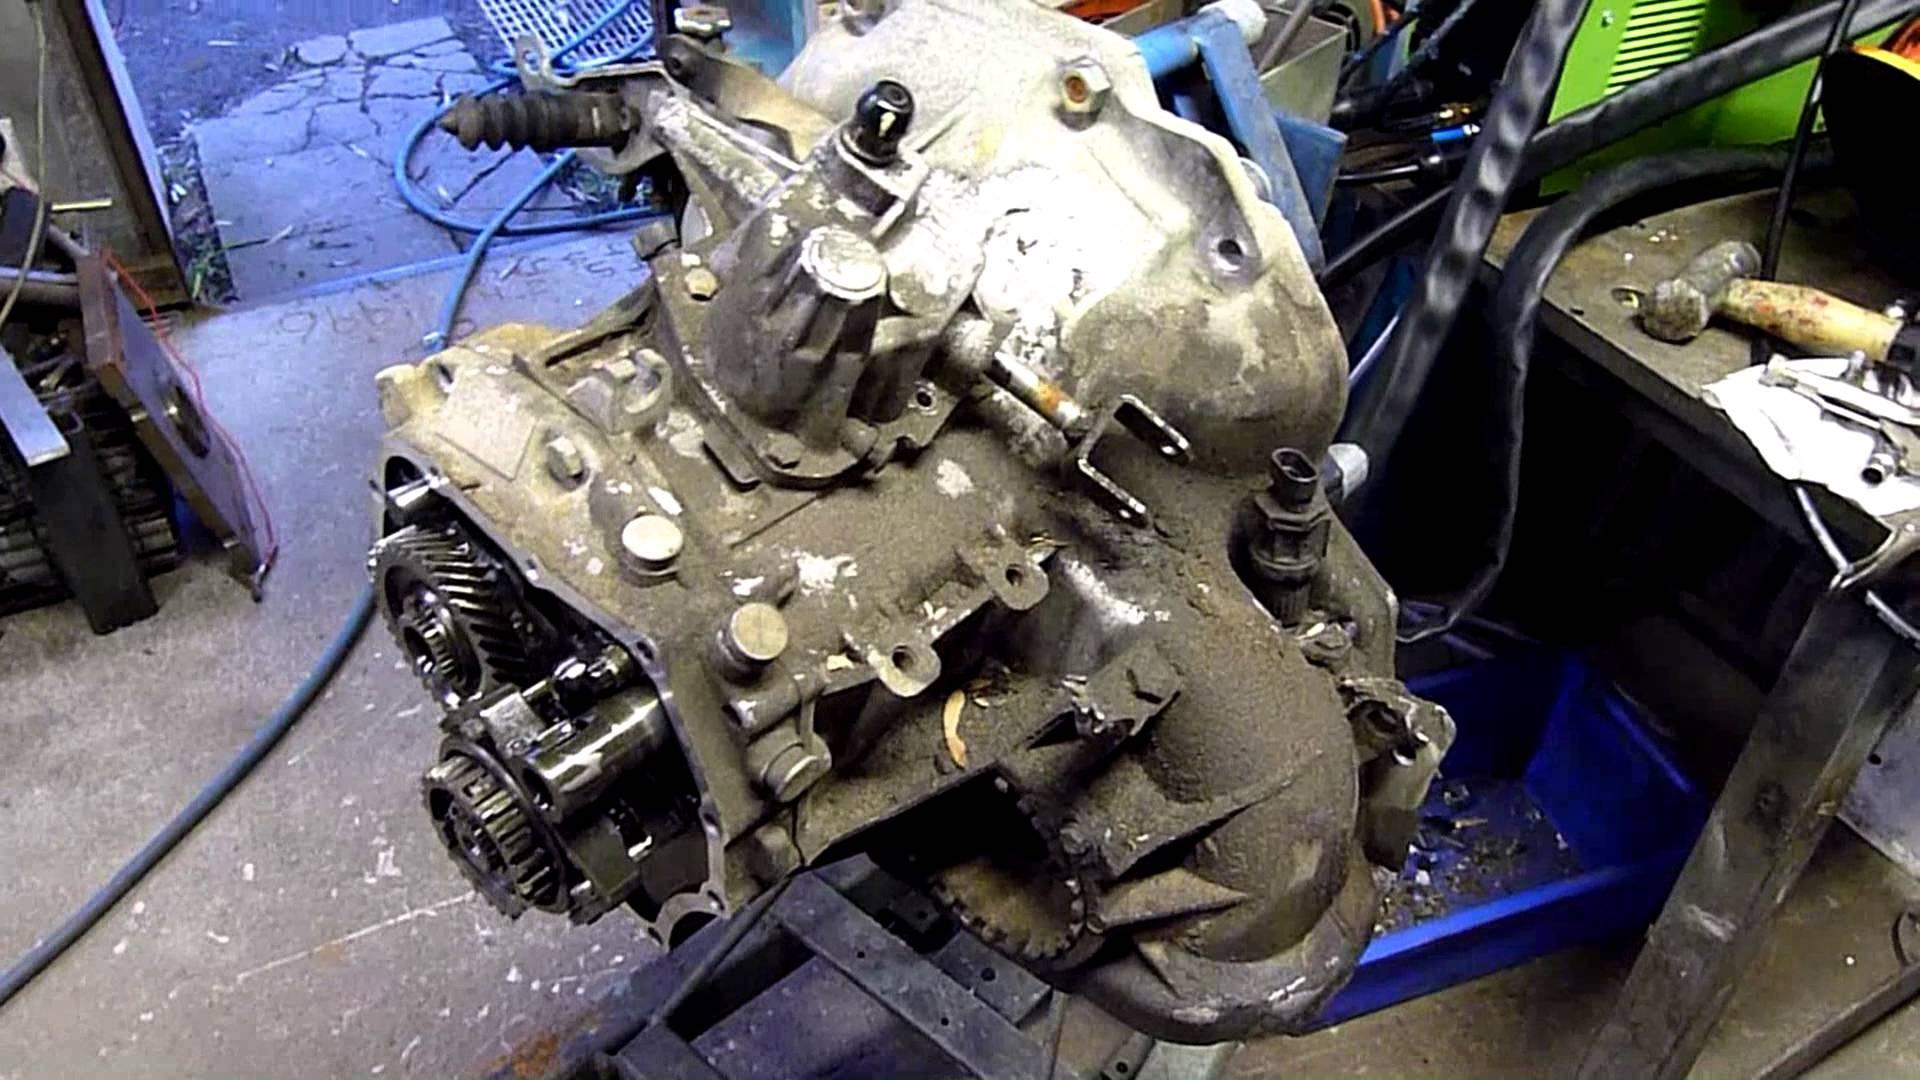 2001 Daewoo Leganza Engine Diagram